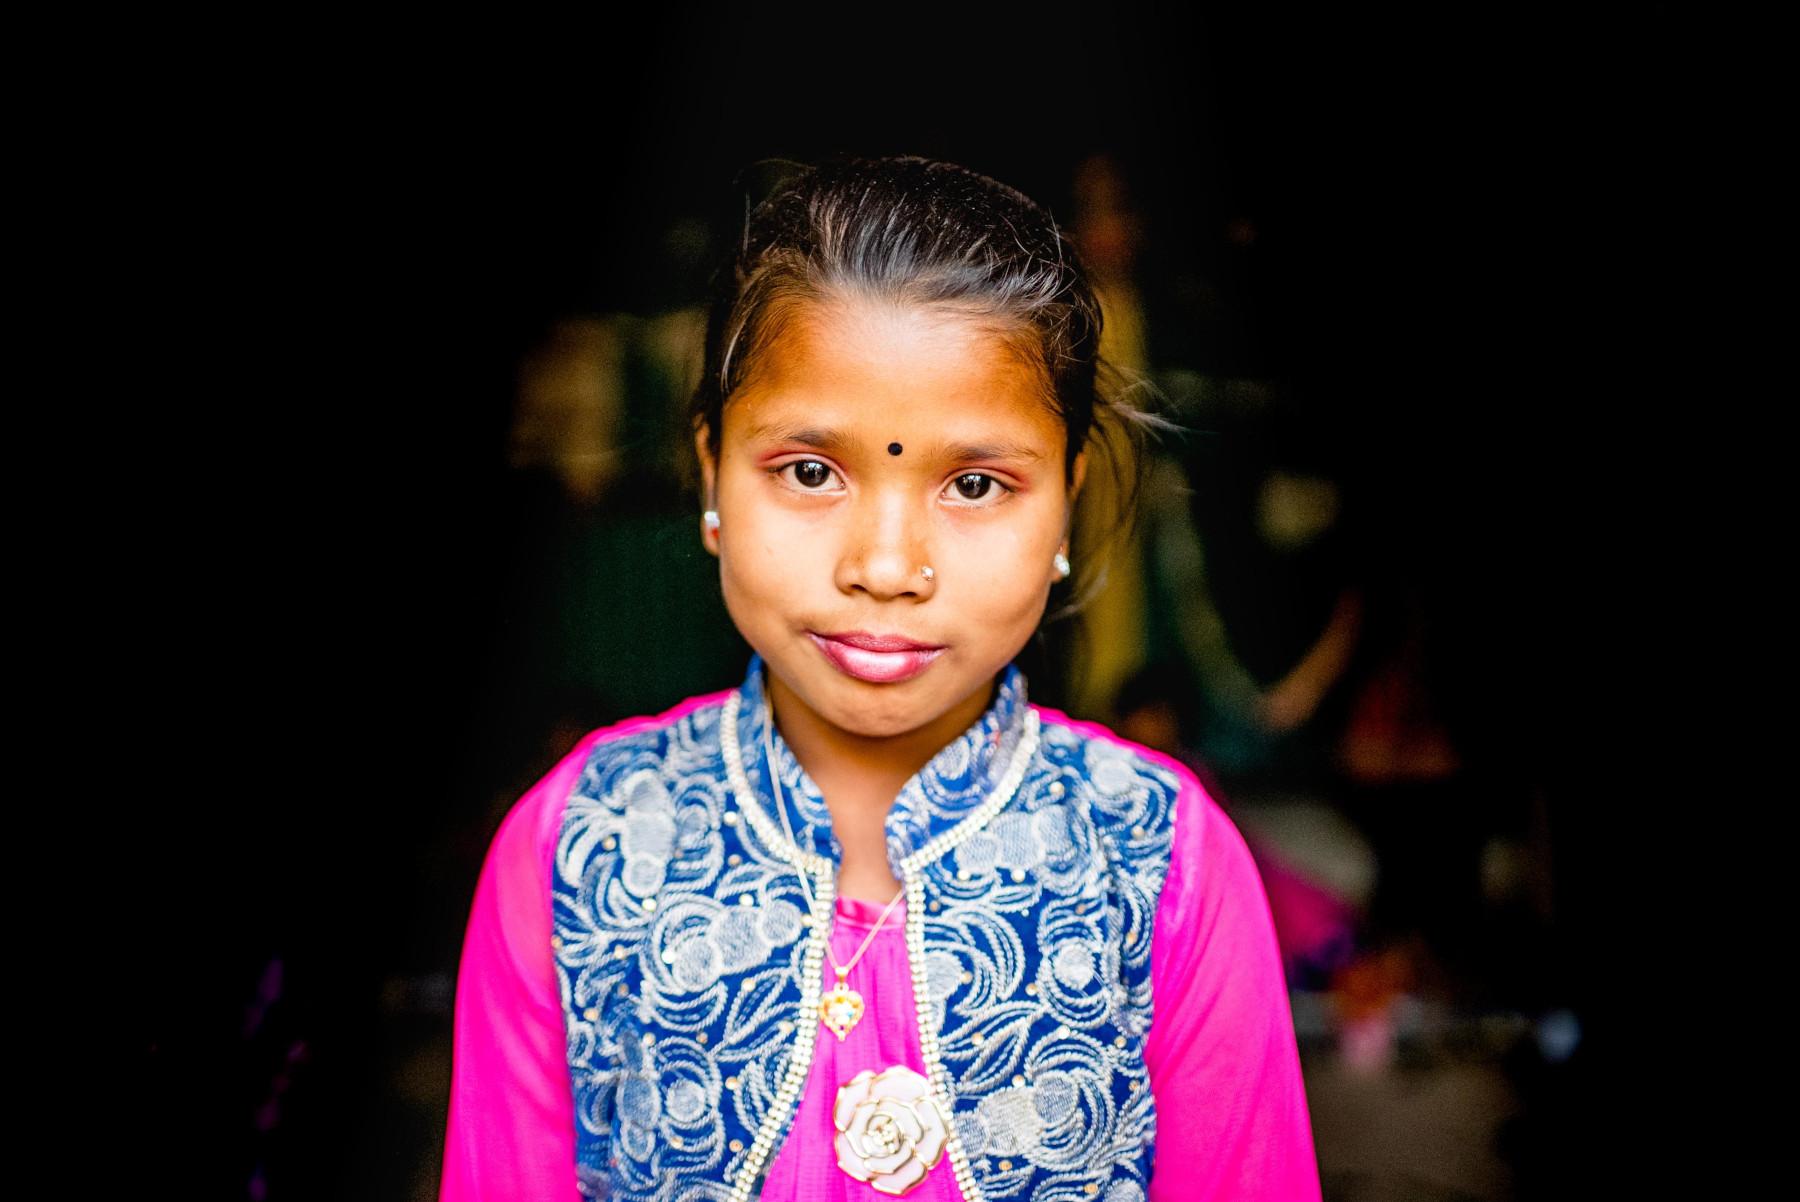 OM USA sounds an alarm for South Asia children